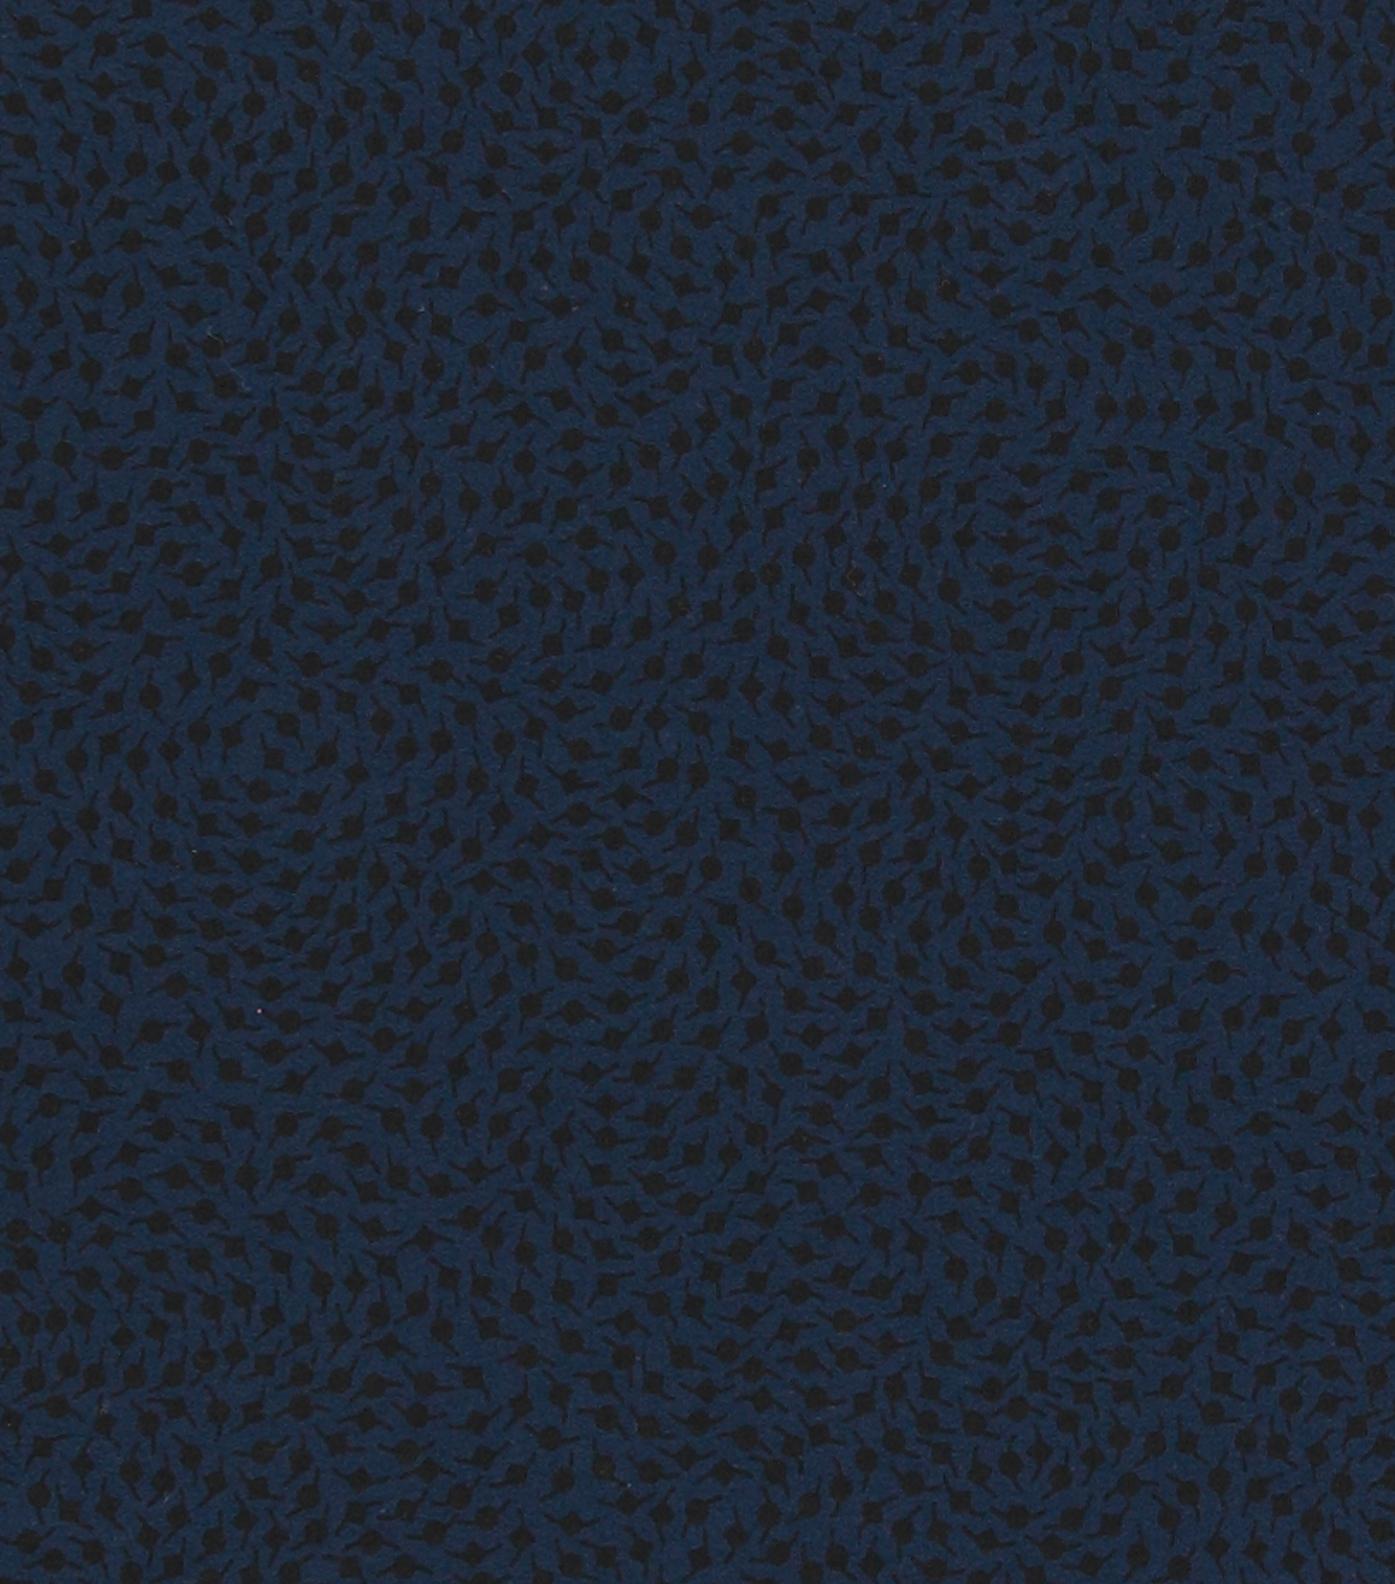 Tee-shirt Helmo - Navy